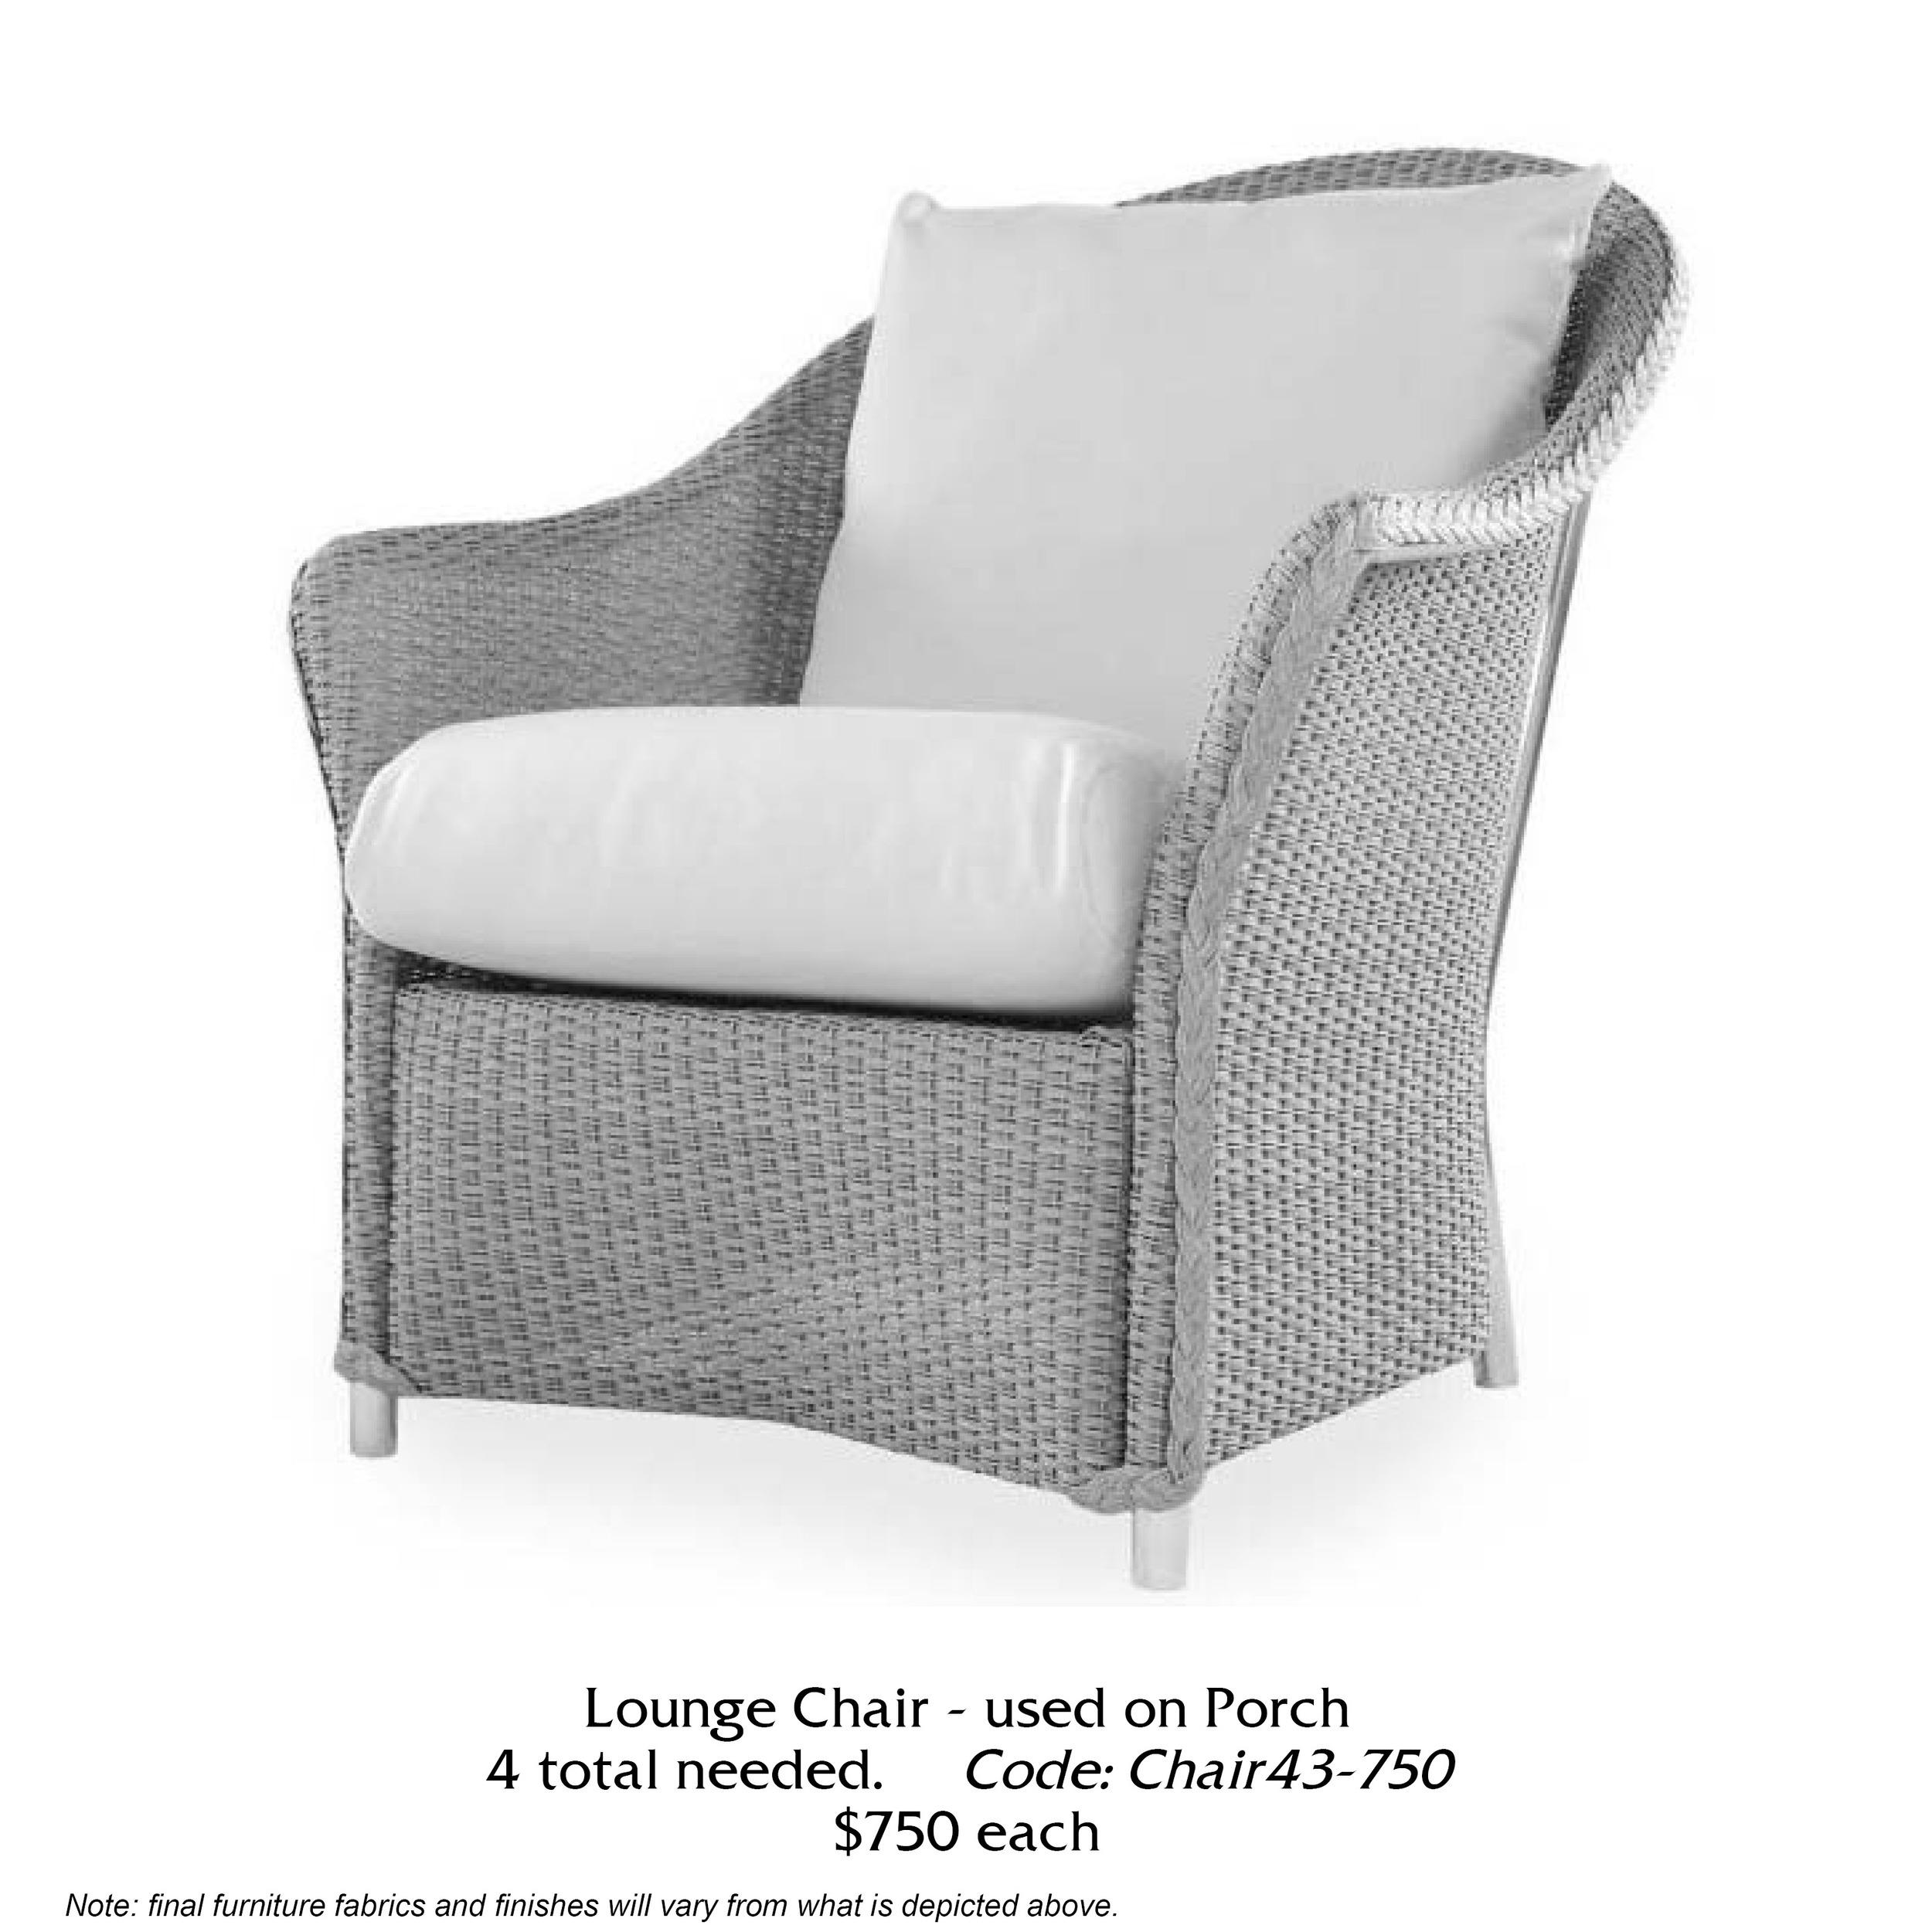 A153-F43-B127-F76-Lounge Chair - 2-2.jpg